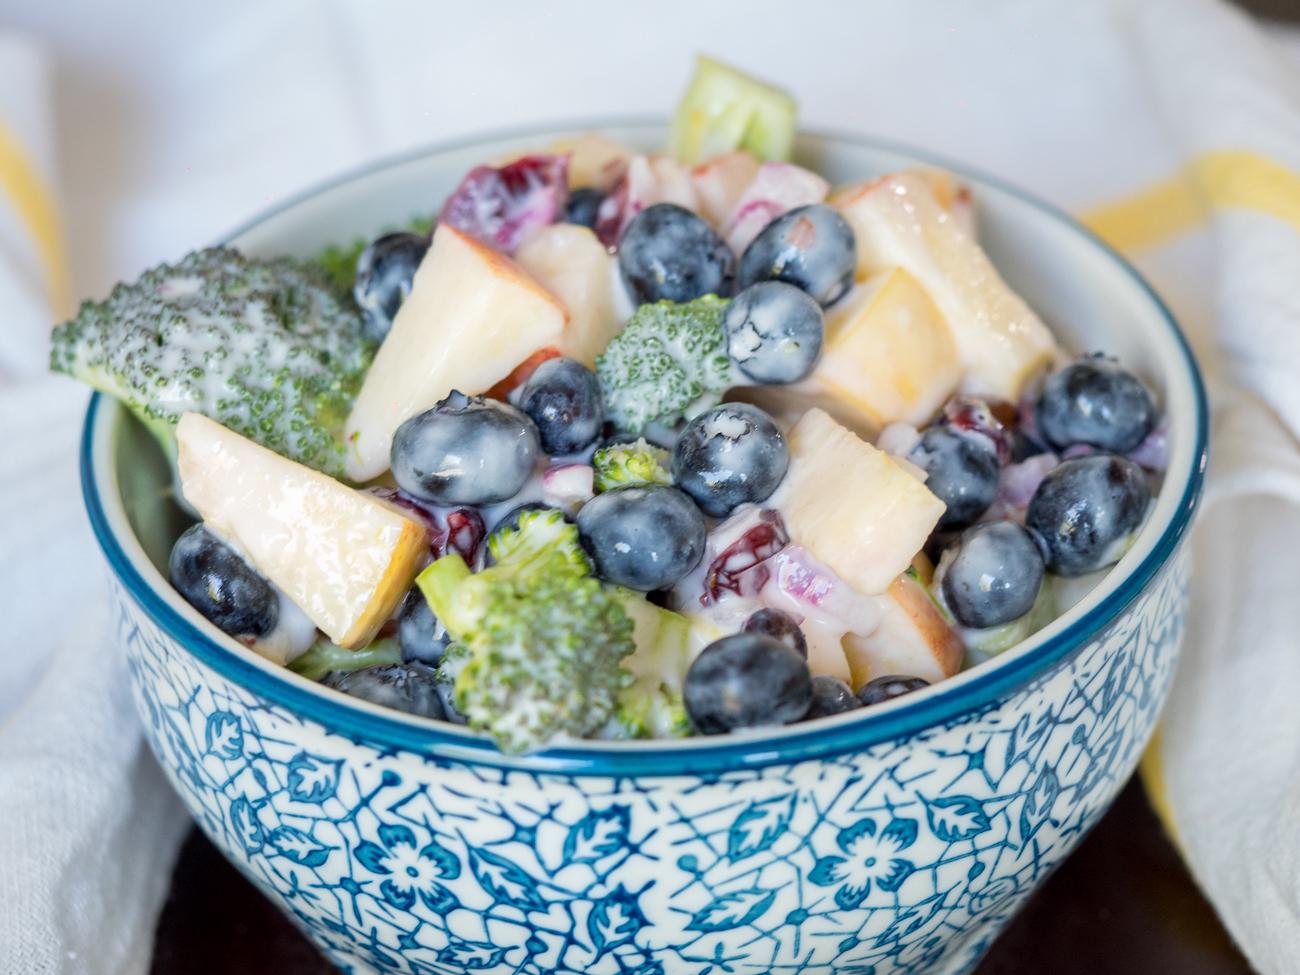 No Mayo Broccoli And Blueberry Salad 12 Tomatoes